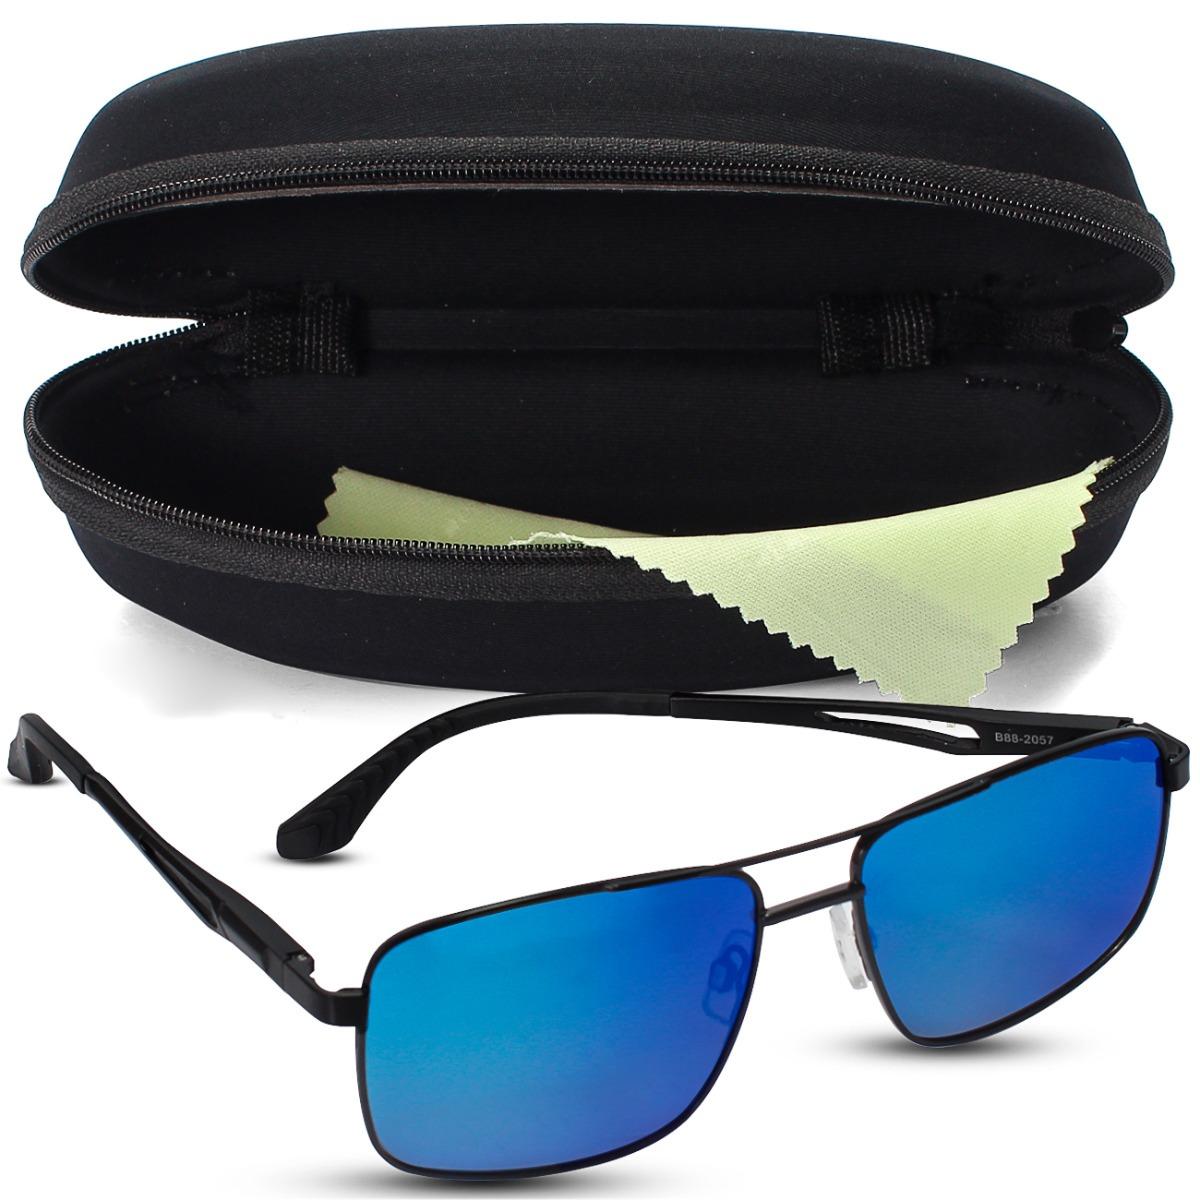 195c9476aeea9 oculos de sol masculino esportivo lente polarizada espelhada. Carregando  zoom.